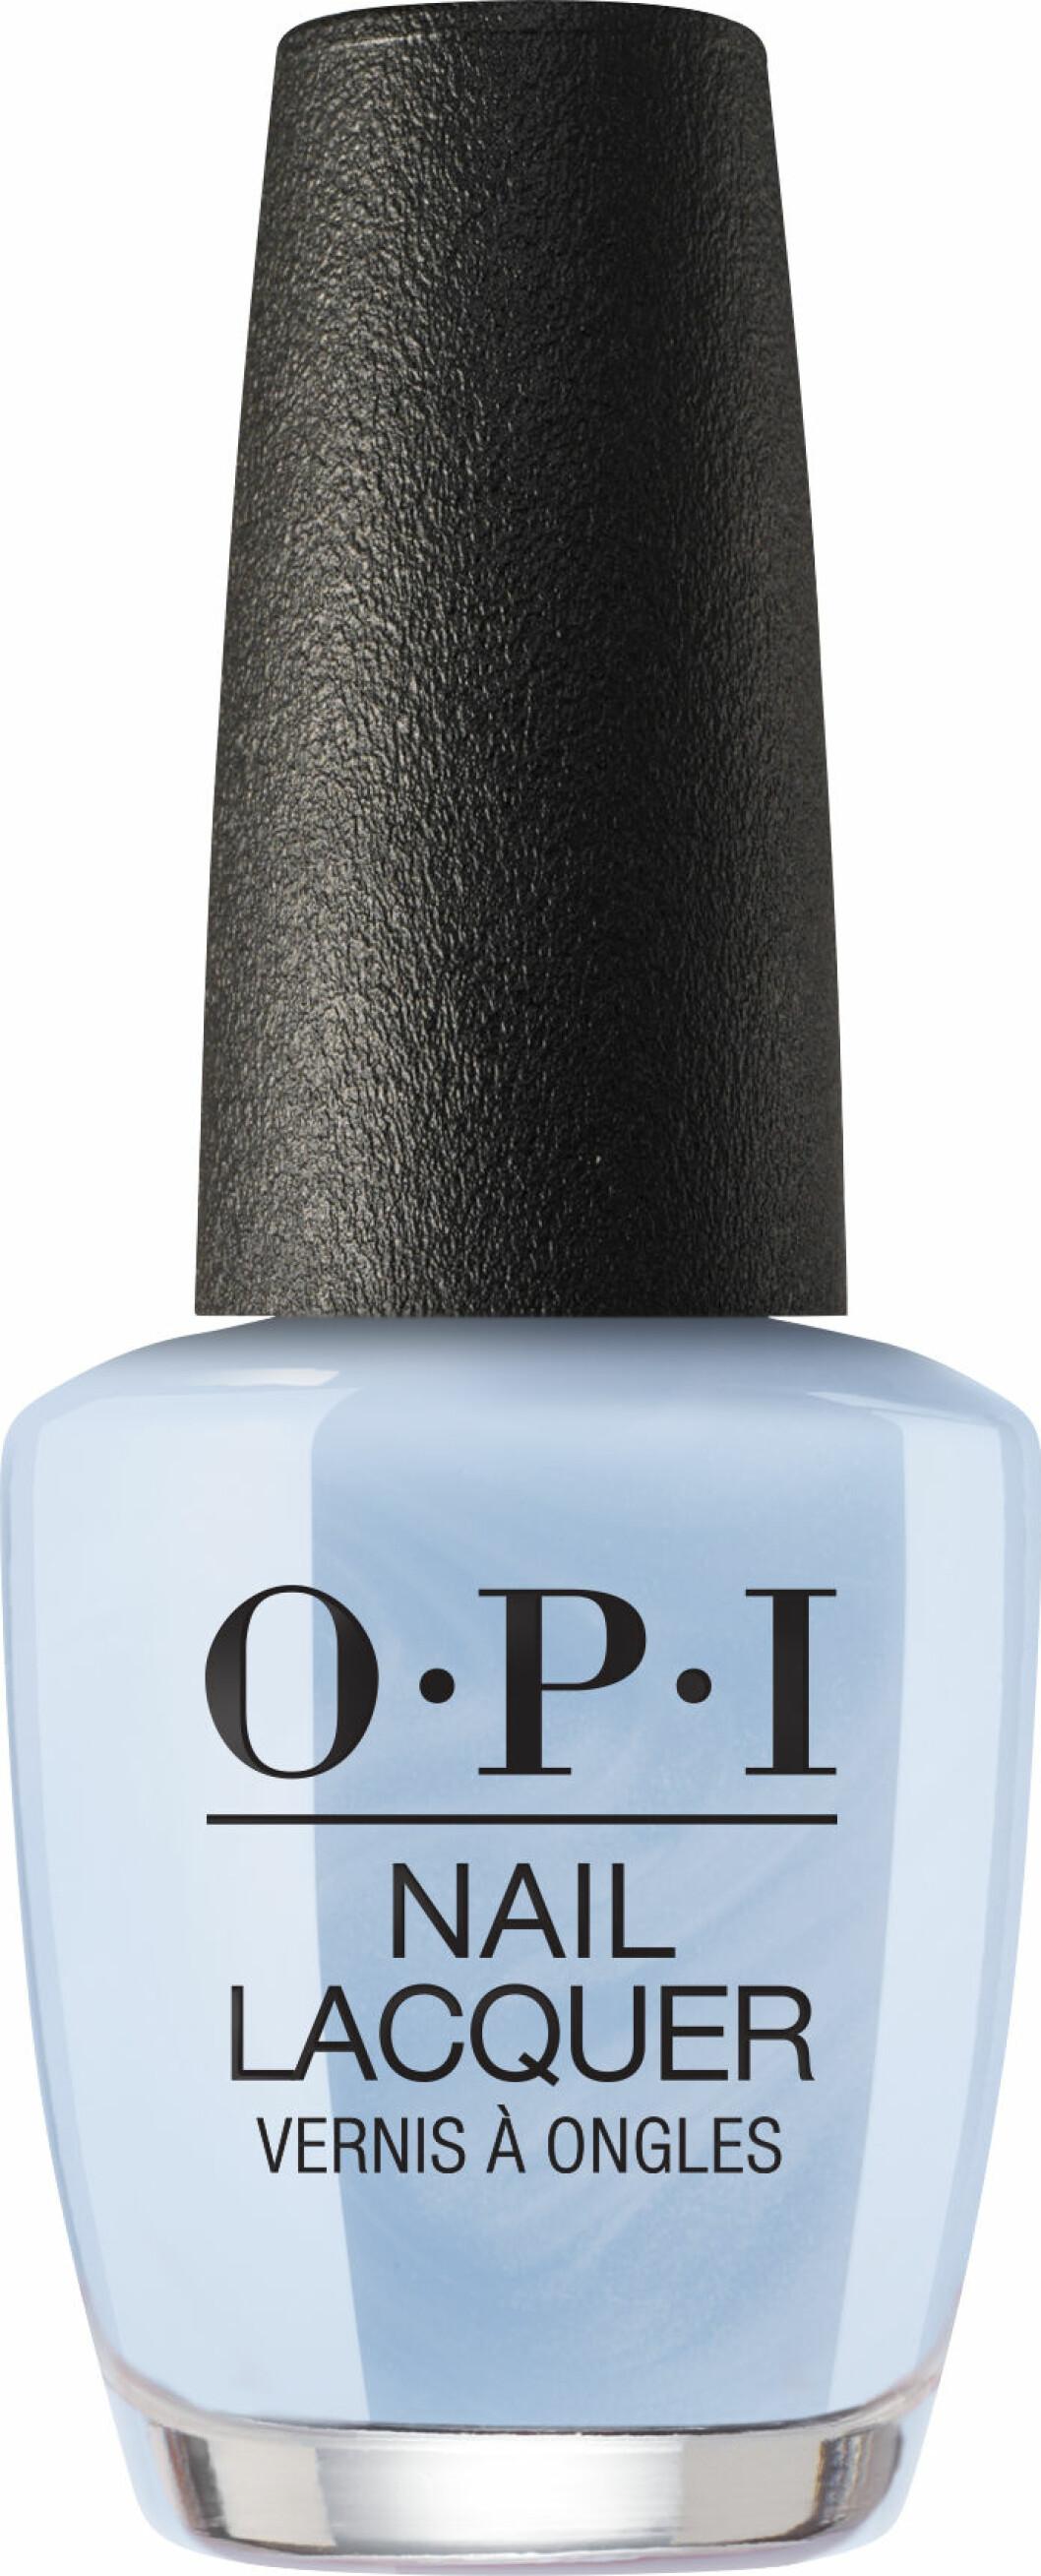 Babysteps med babyblått nagellack i färgen Did you see those mussels från OPI.